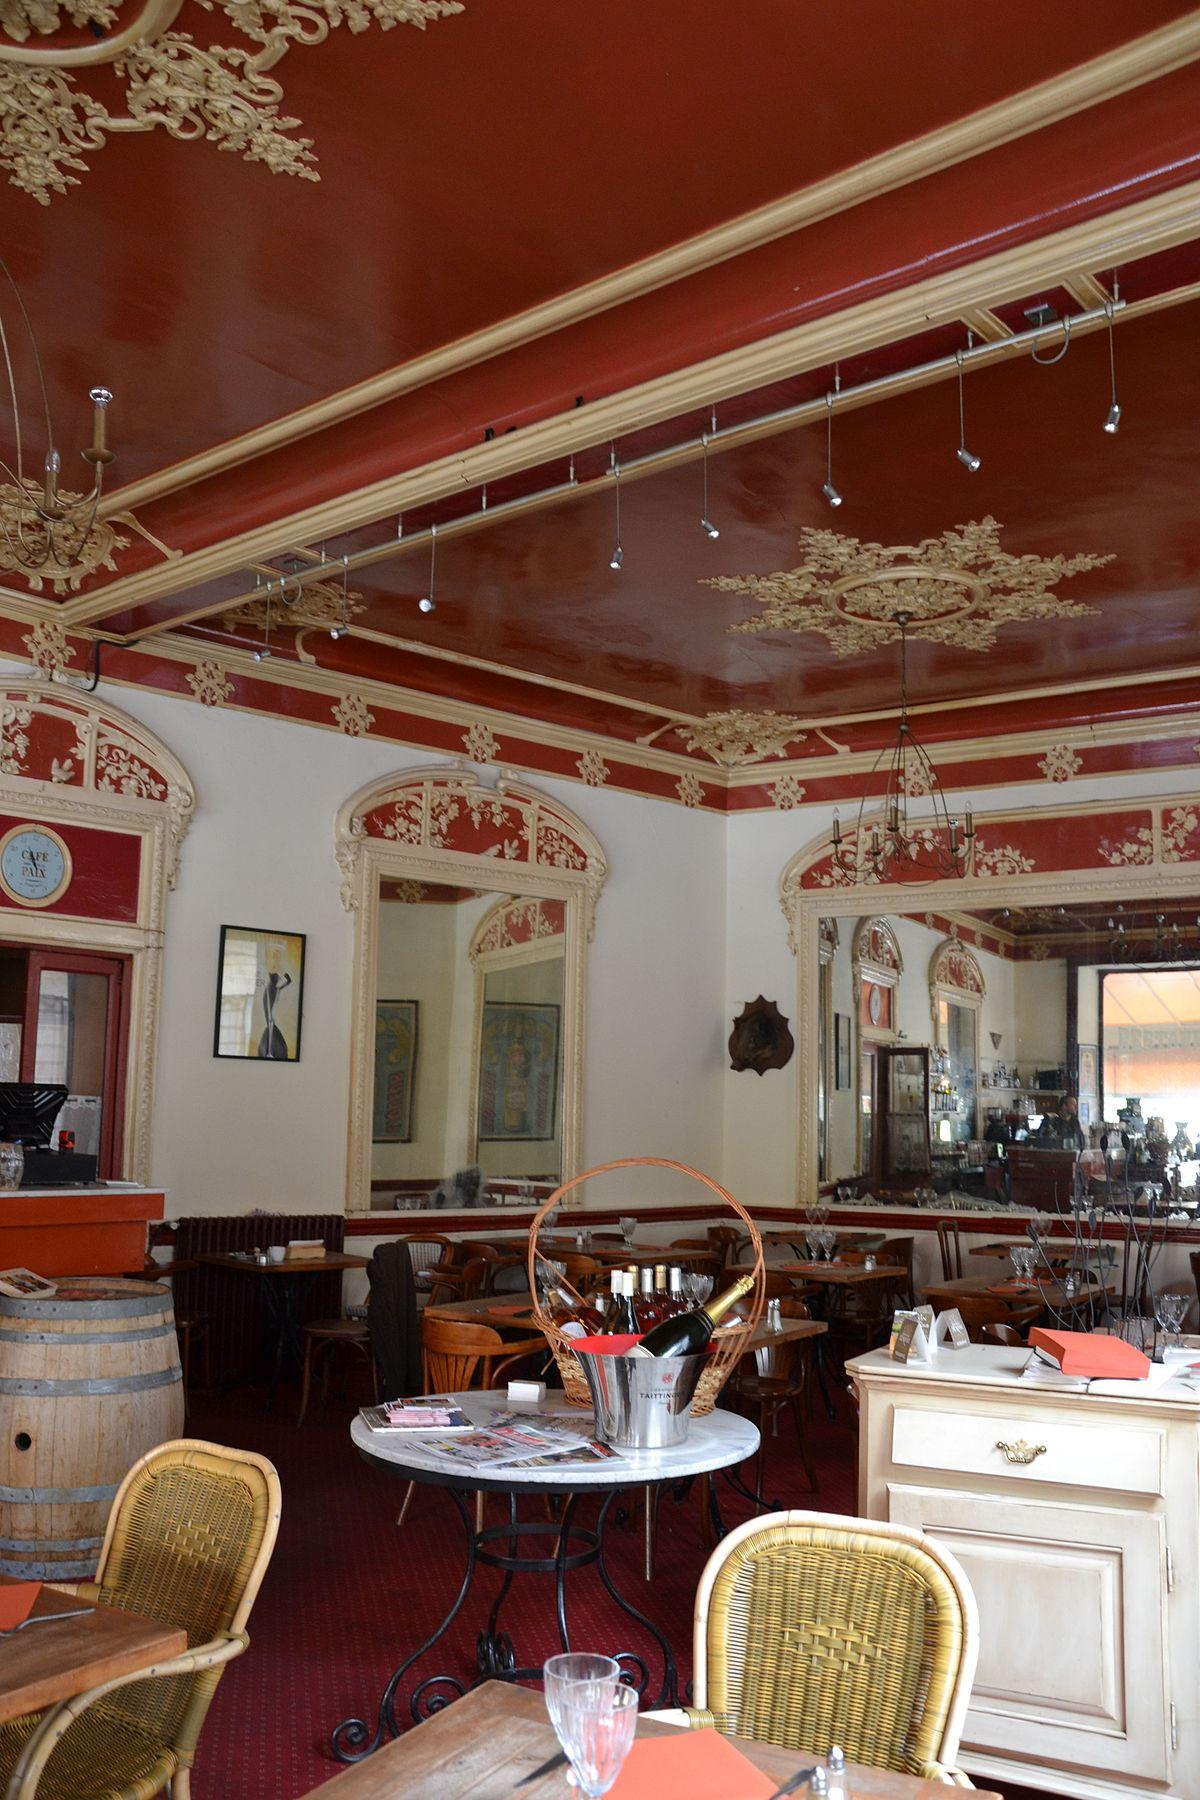 Restaurant Le Grand Hotel Valreas